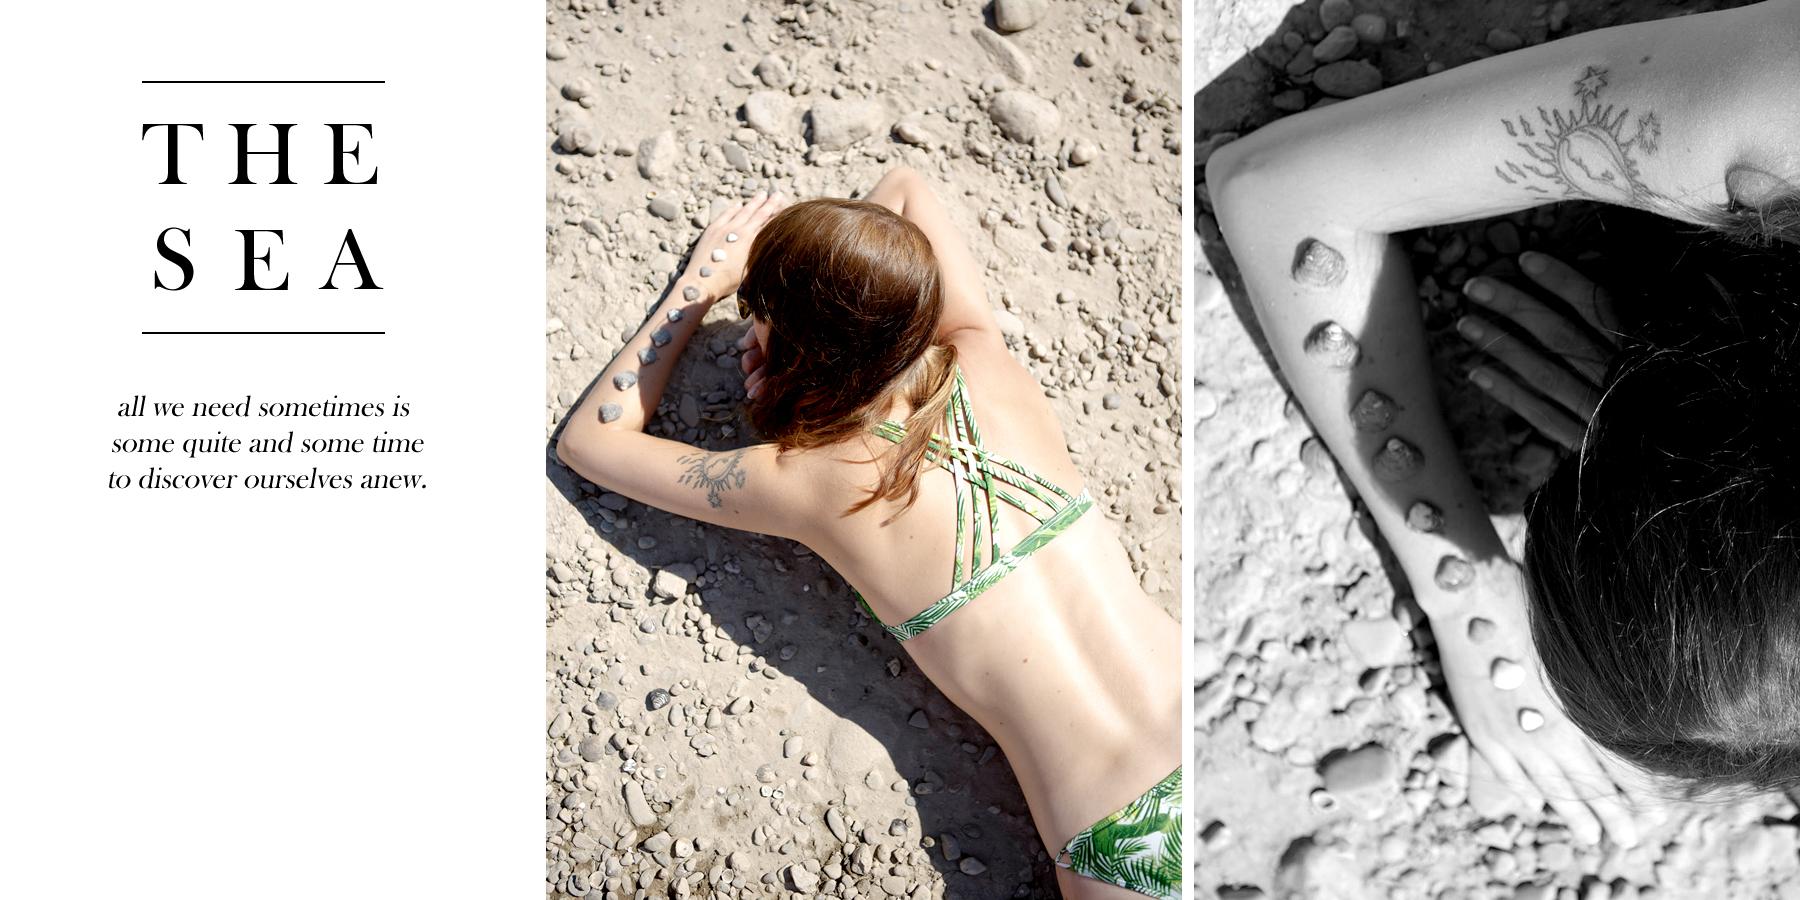 bikini beach strand rhein river fluss meer baden sommer summer forever 21 swimwear bademode ricarda schernus modeblog düsseldorf fashion blog berlin cats & dogs 5